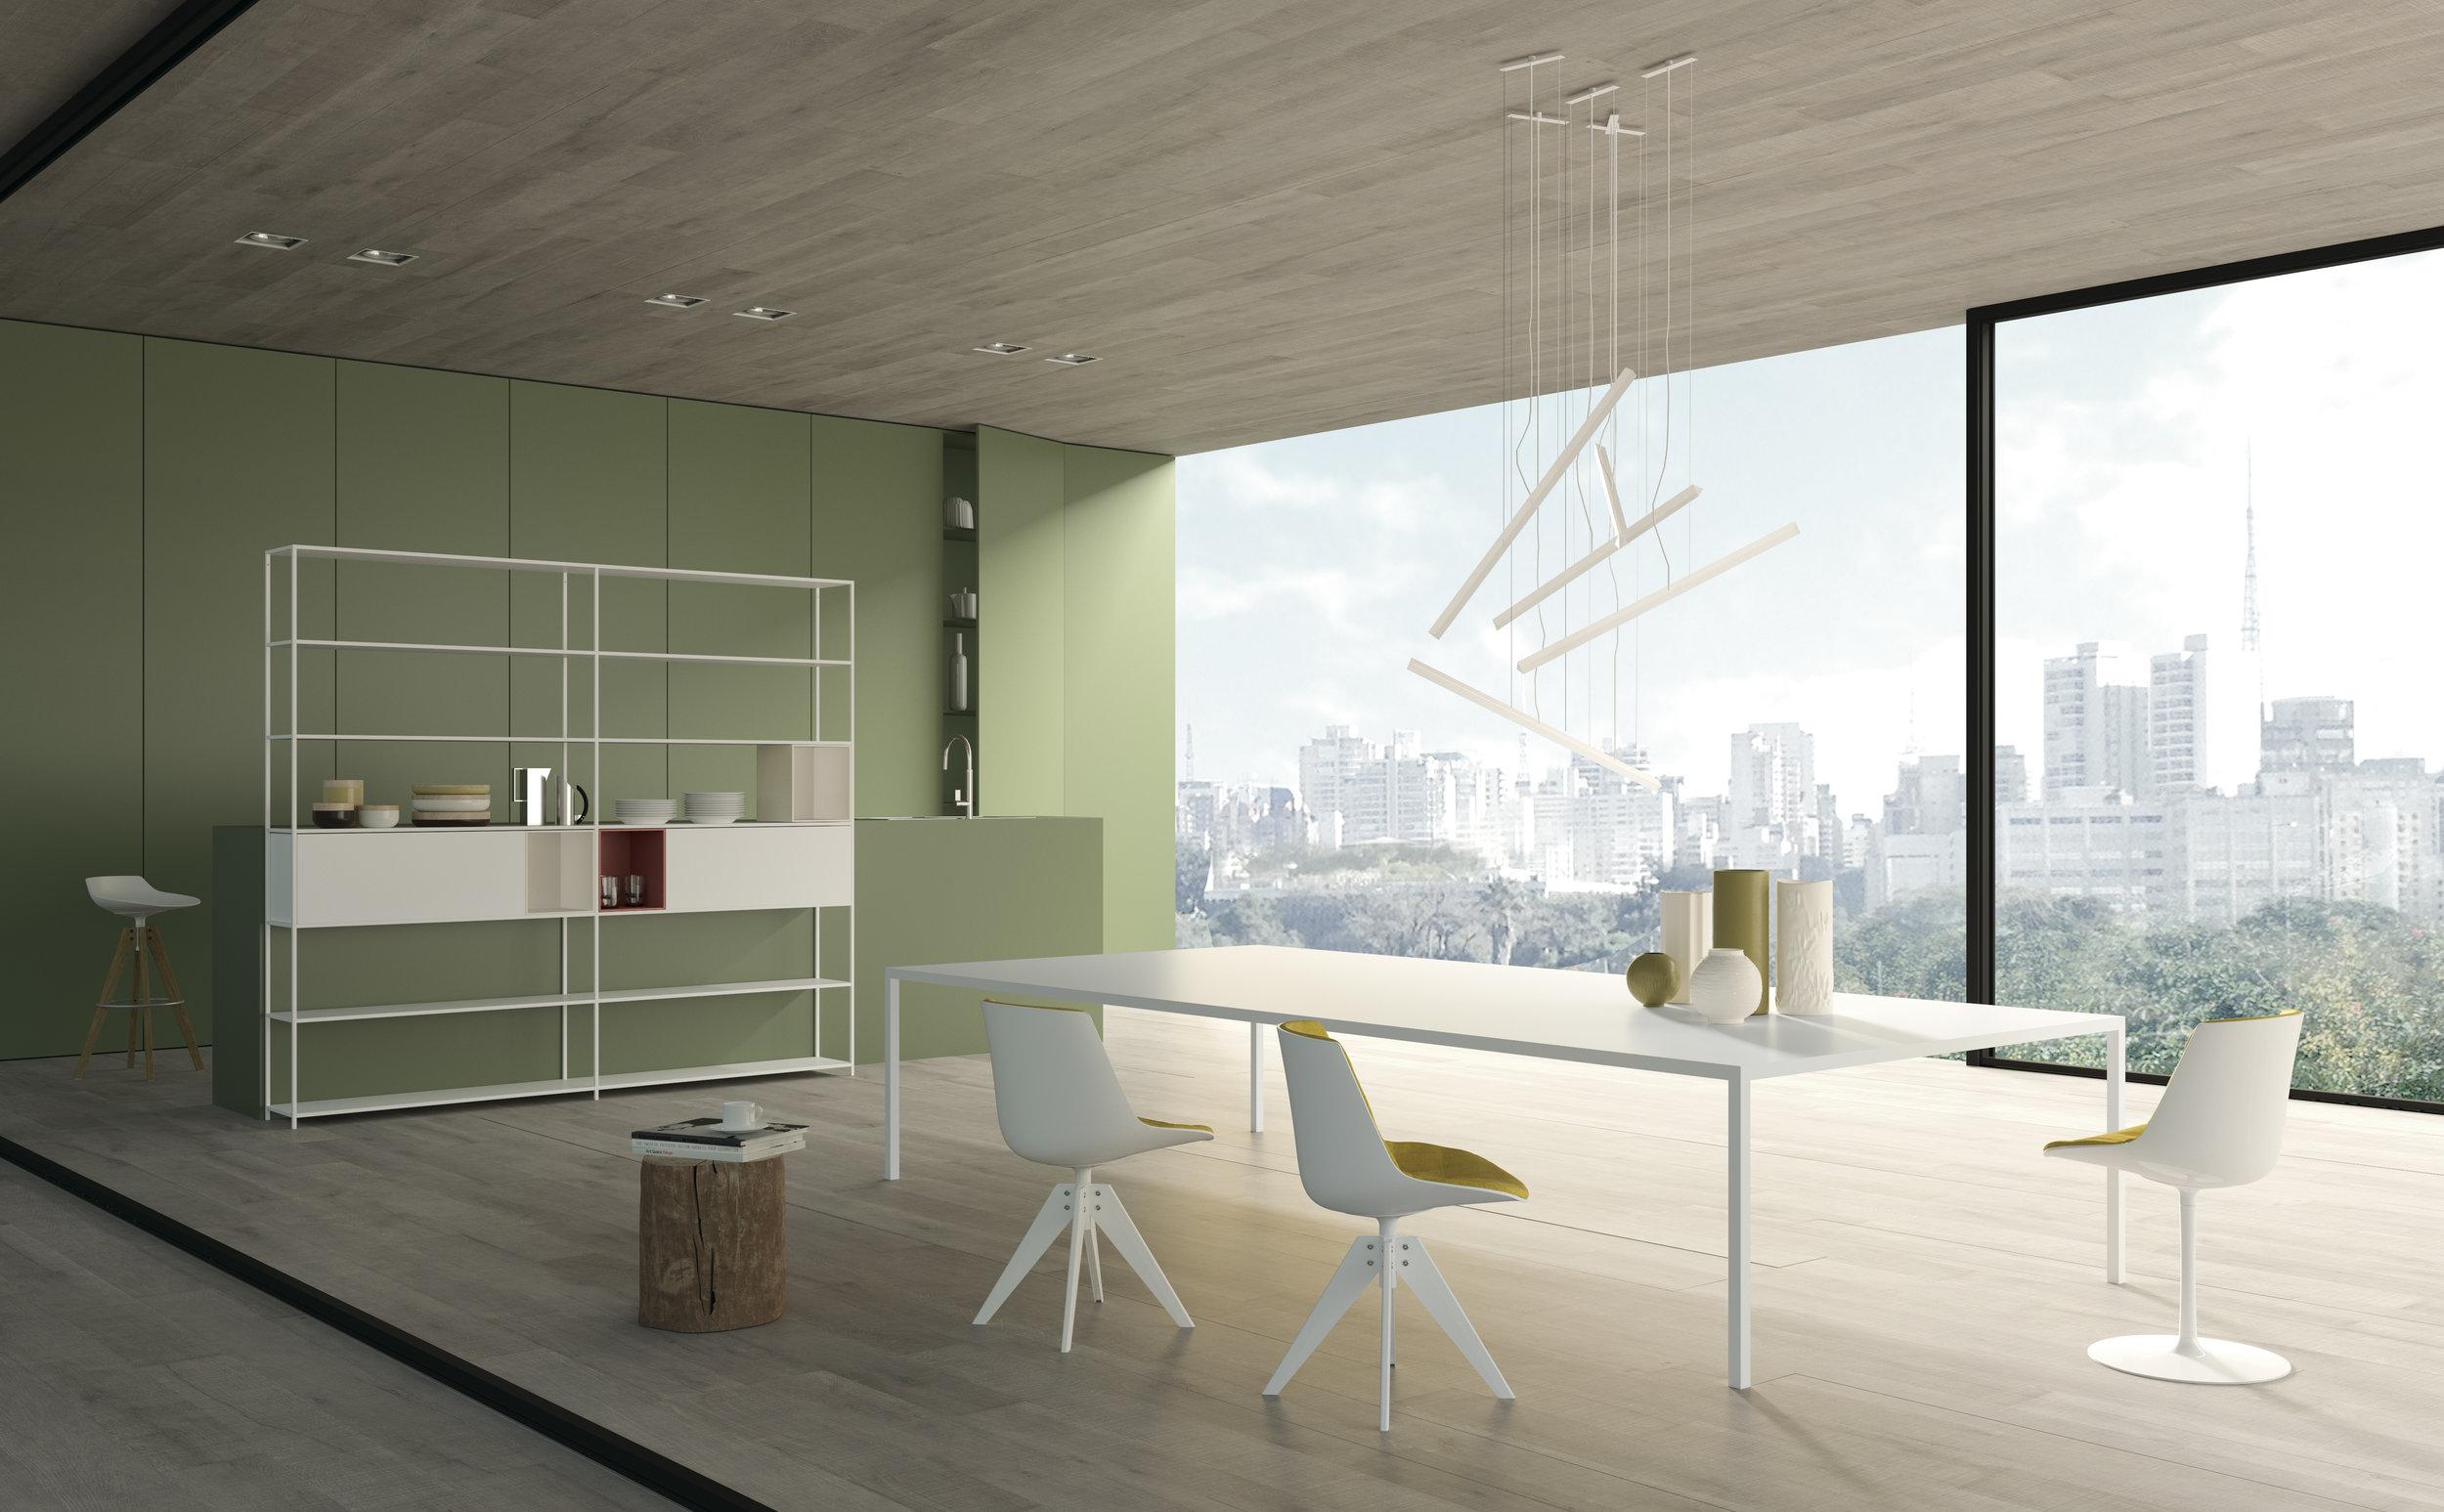 Richt je woonkamer warm en minimalistisch in